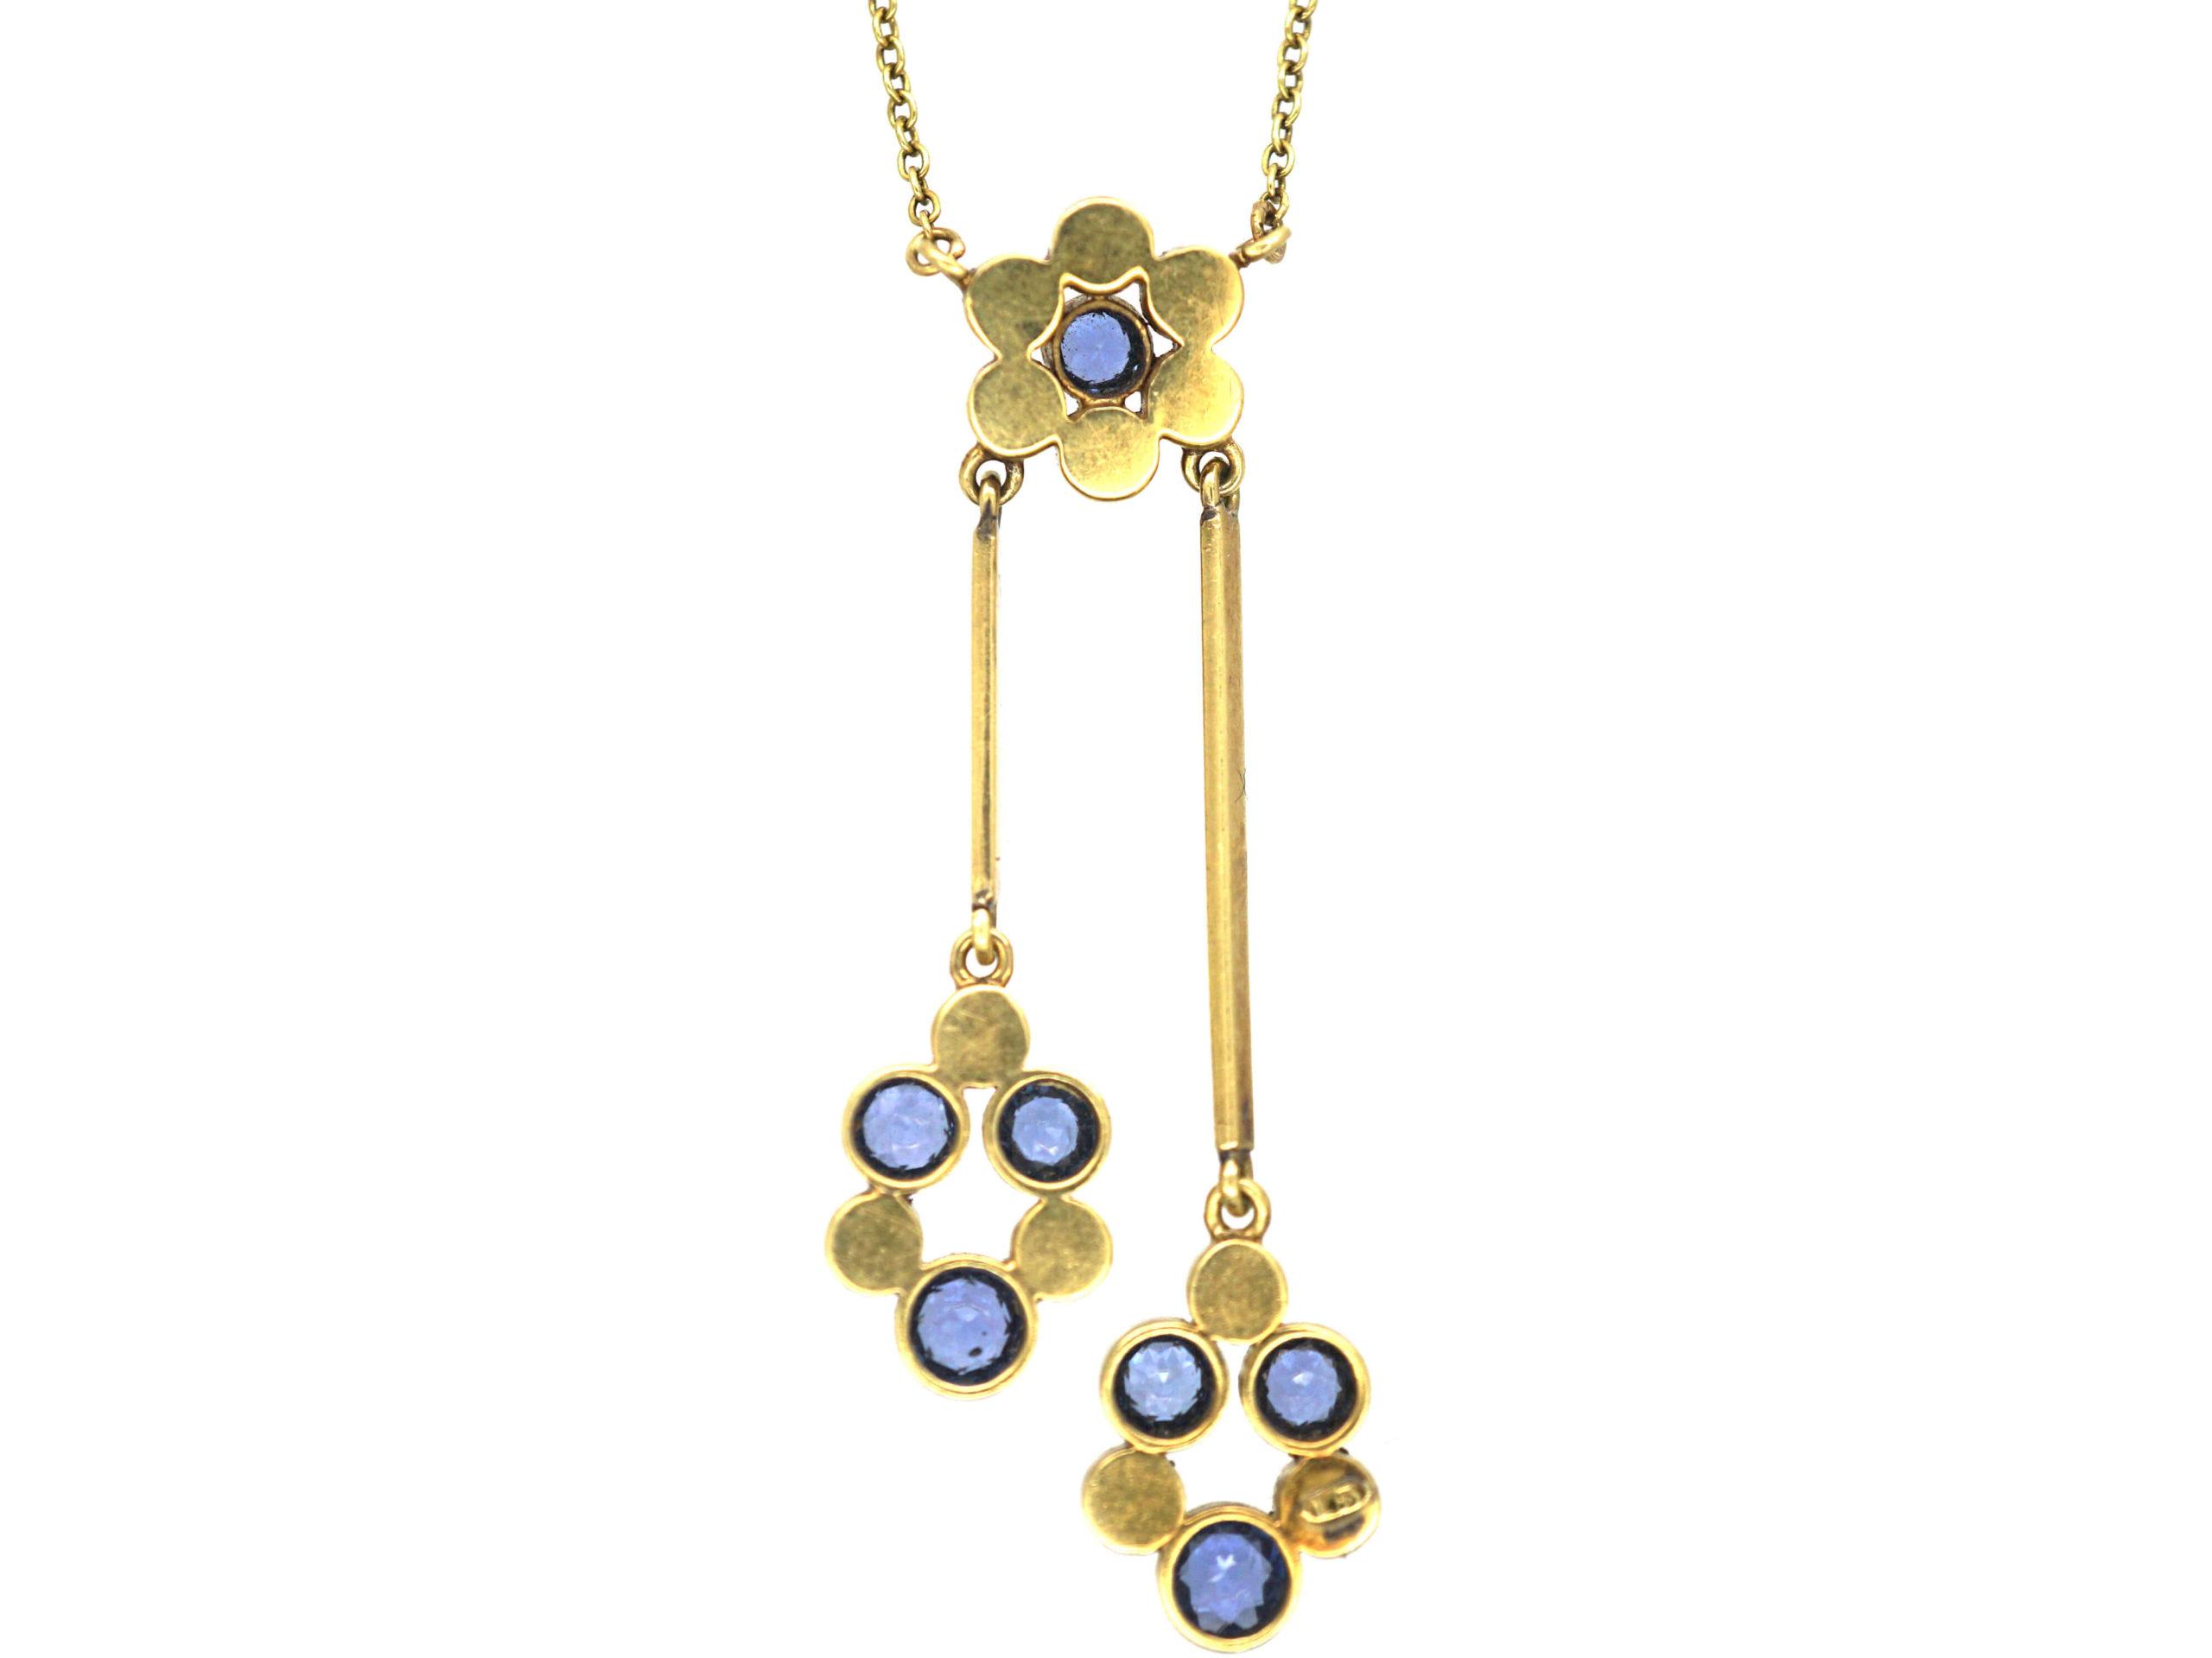 Edwardian 15ct Gold Sapphire & Natural Split Pearls Negligee Design Pendant